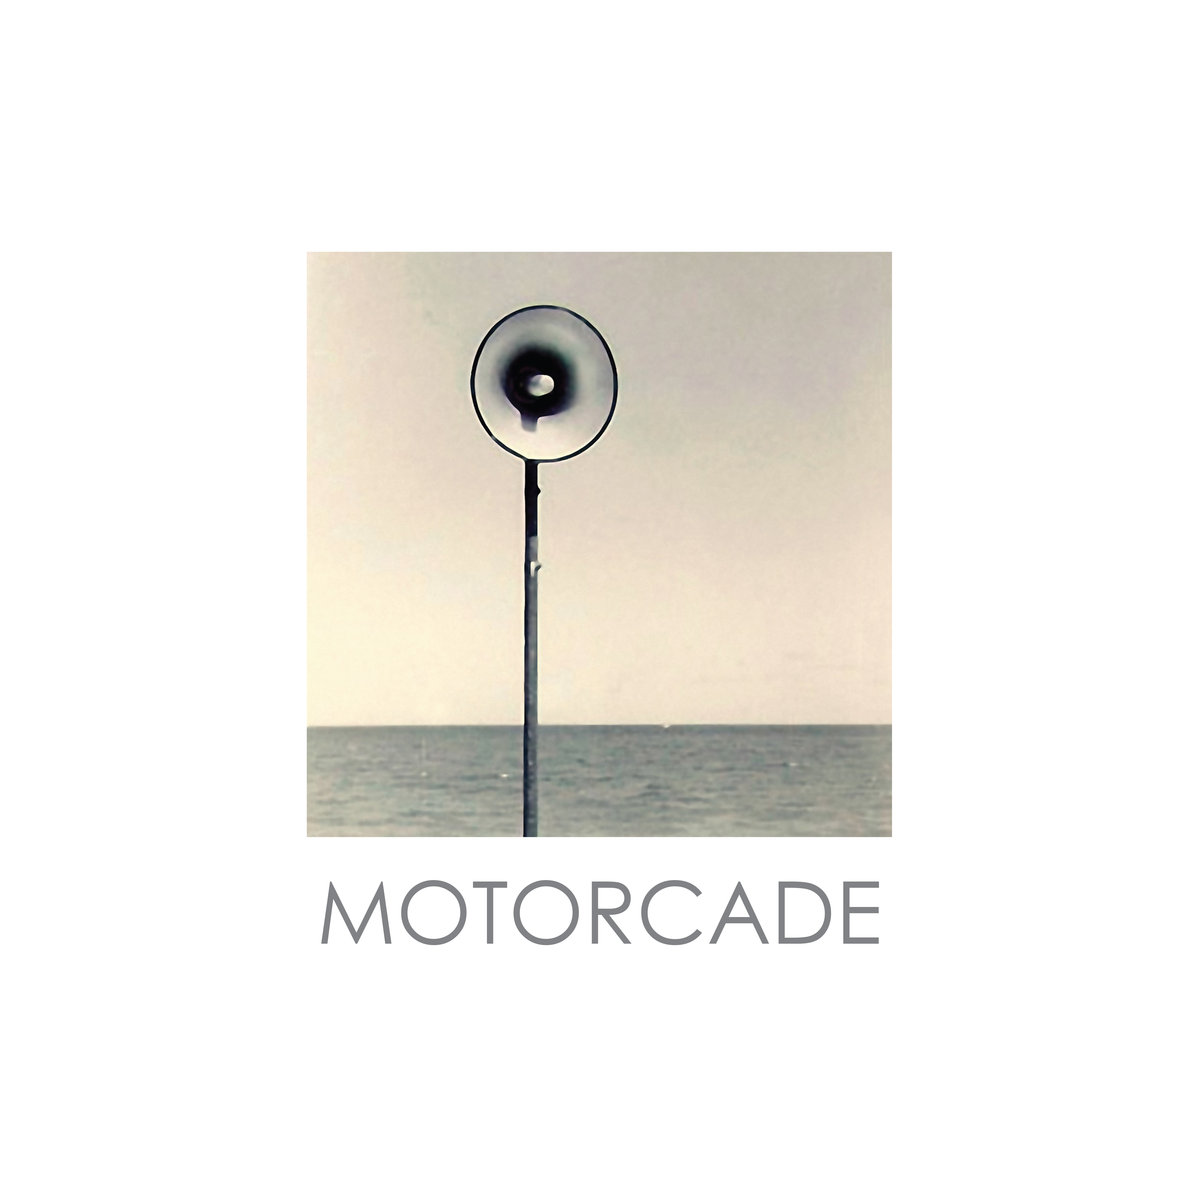 MotorcadeMotorcade - LINKSBandcampFacebookTwitterLISTEN ONSpotifyApple Music